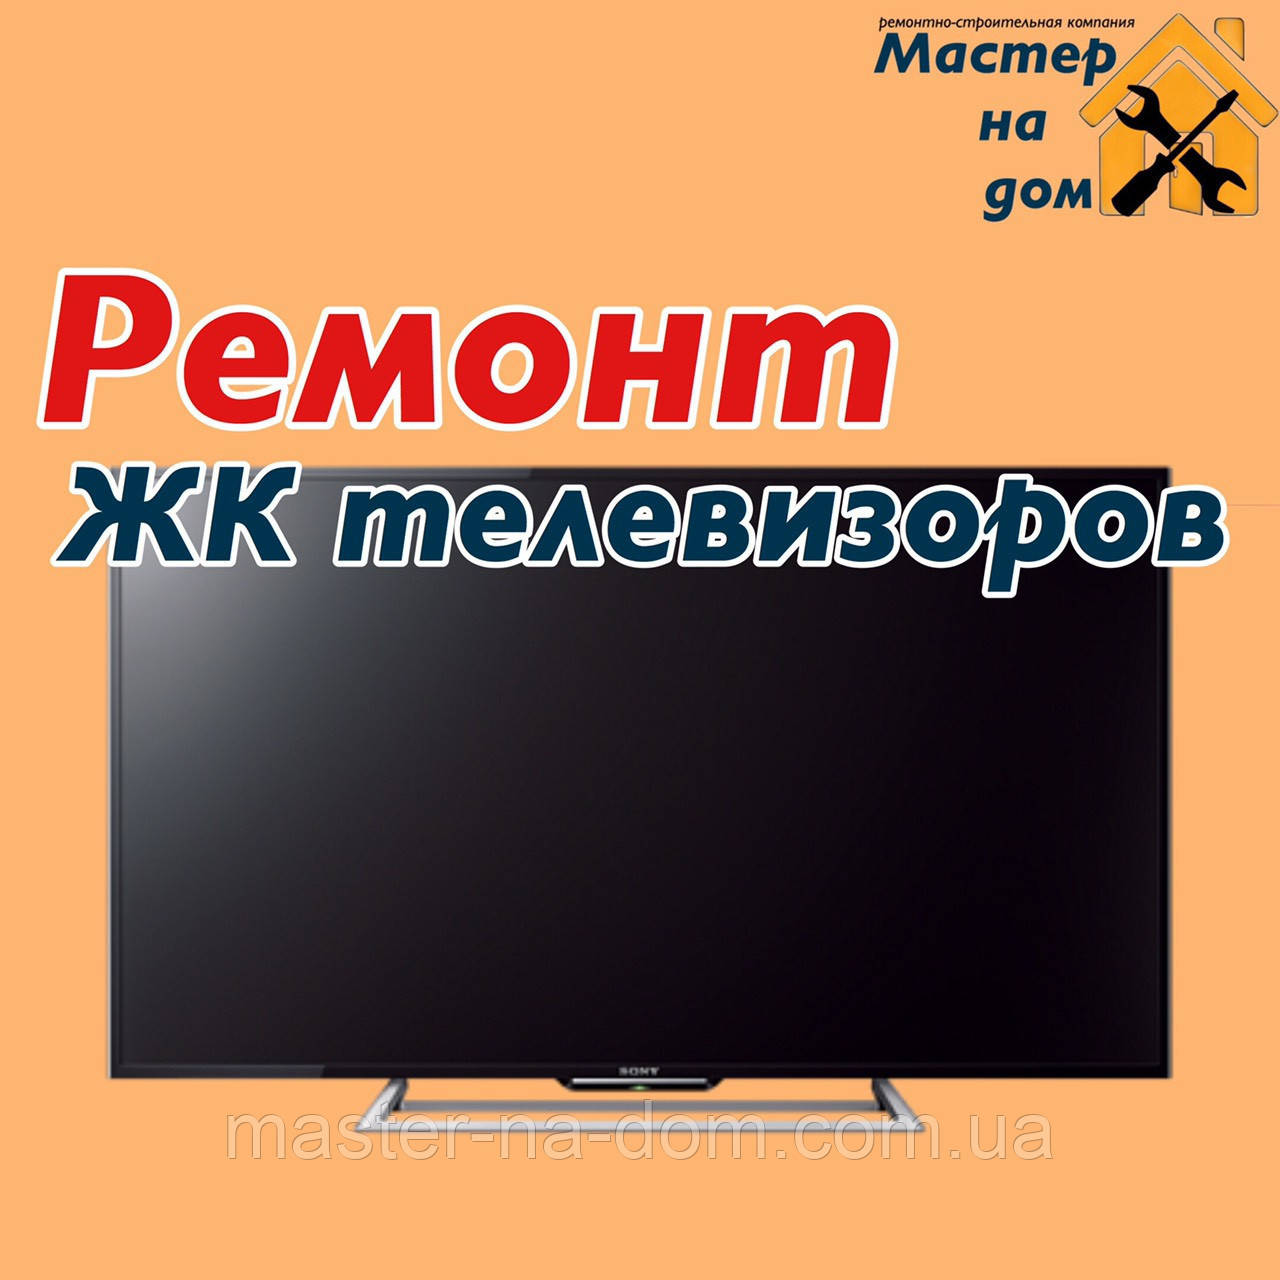 Ремонт ЖК телевизоров на дому в Херсоне